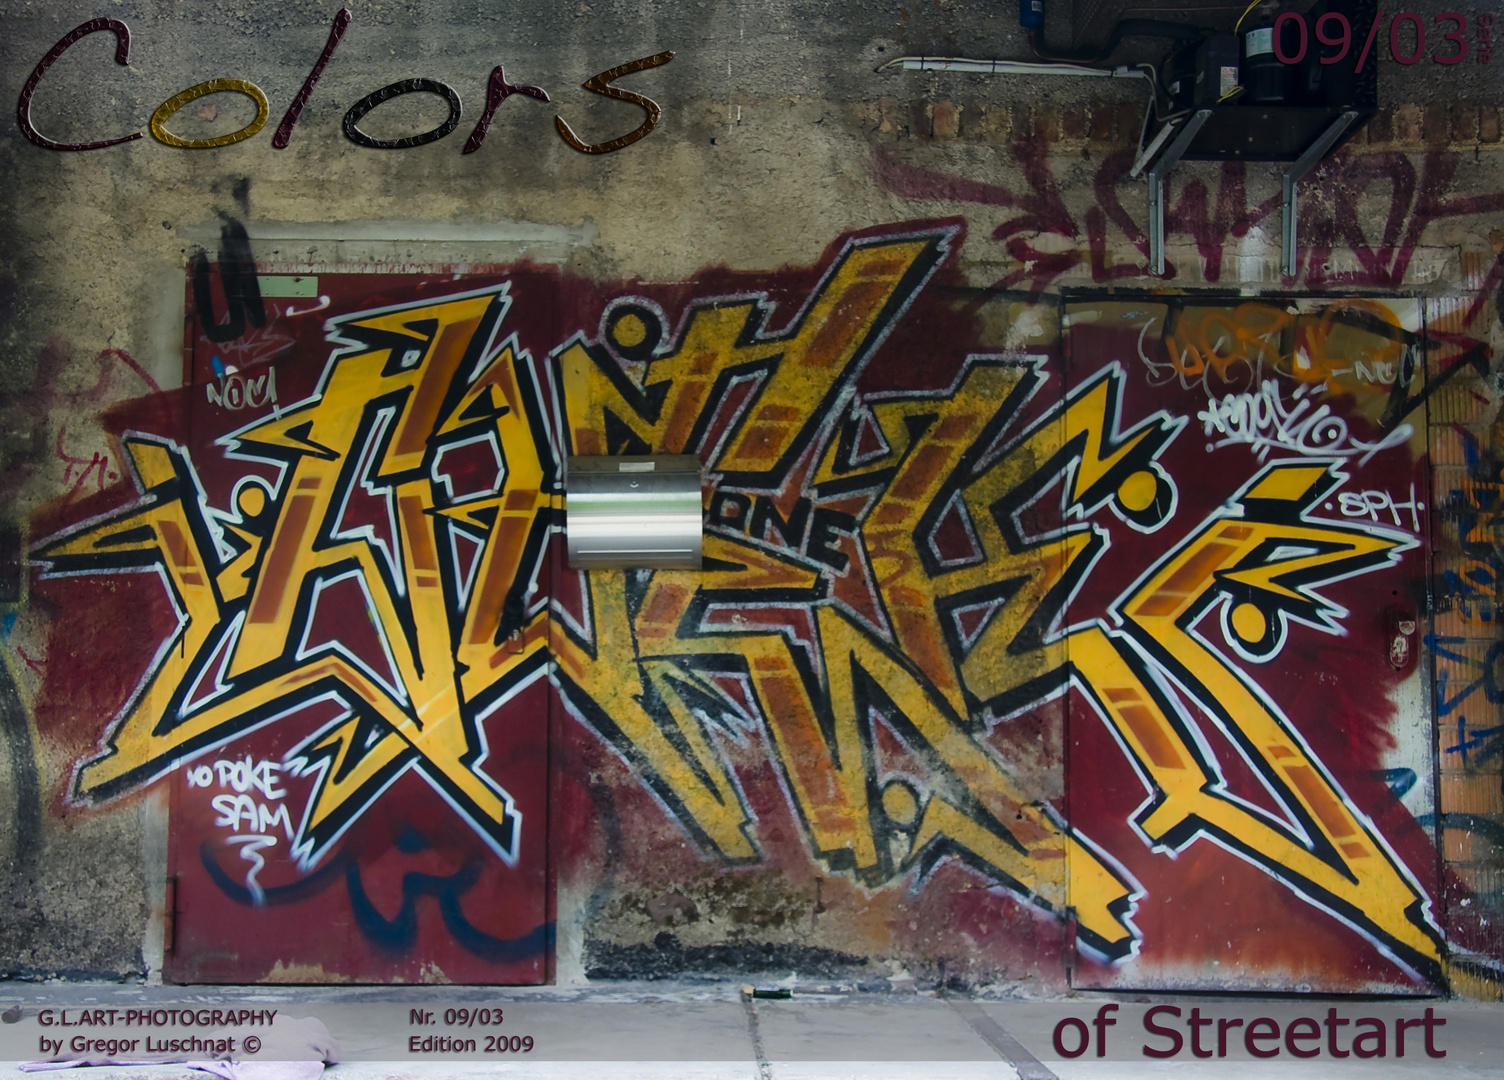 COLORS of Streetart 3